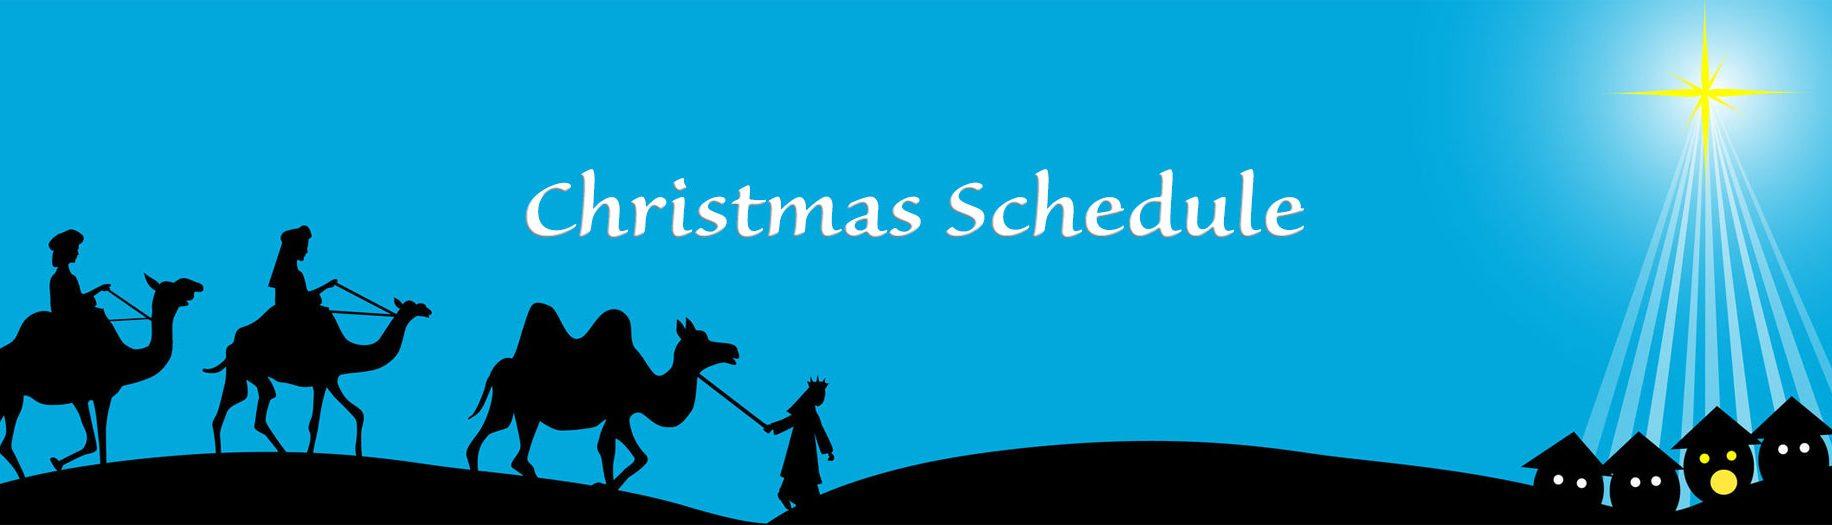 Christmas Schedule 2018